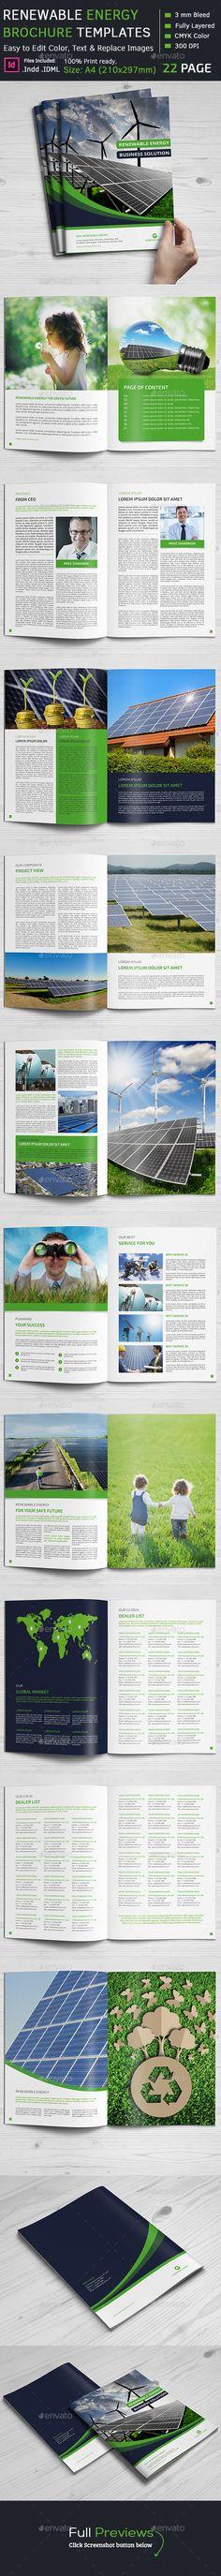 Renewable Energy Brochure Template #design Download: http://graphicriver.net/item/renewable-energy-brochure/12165777?ref=ksioks